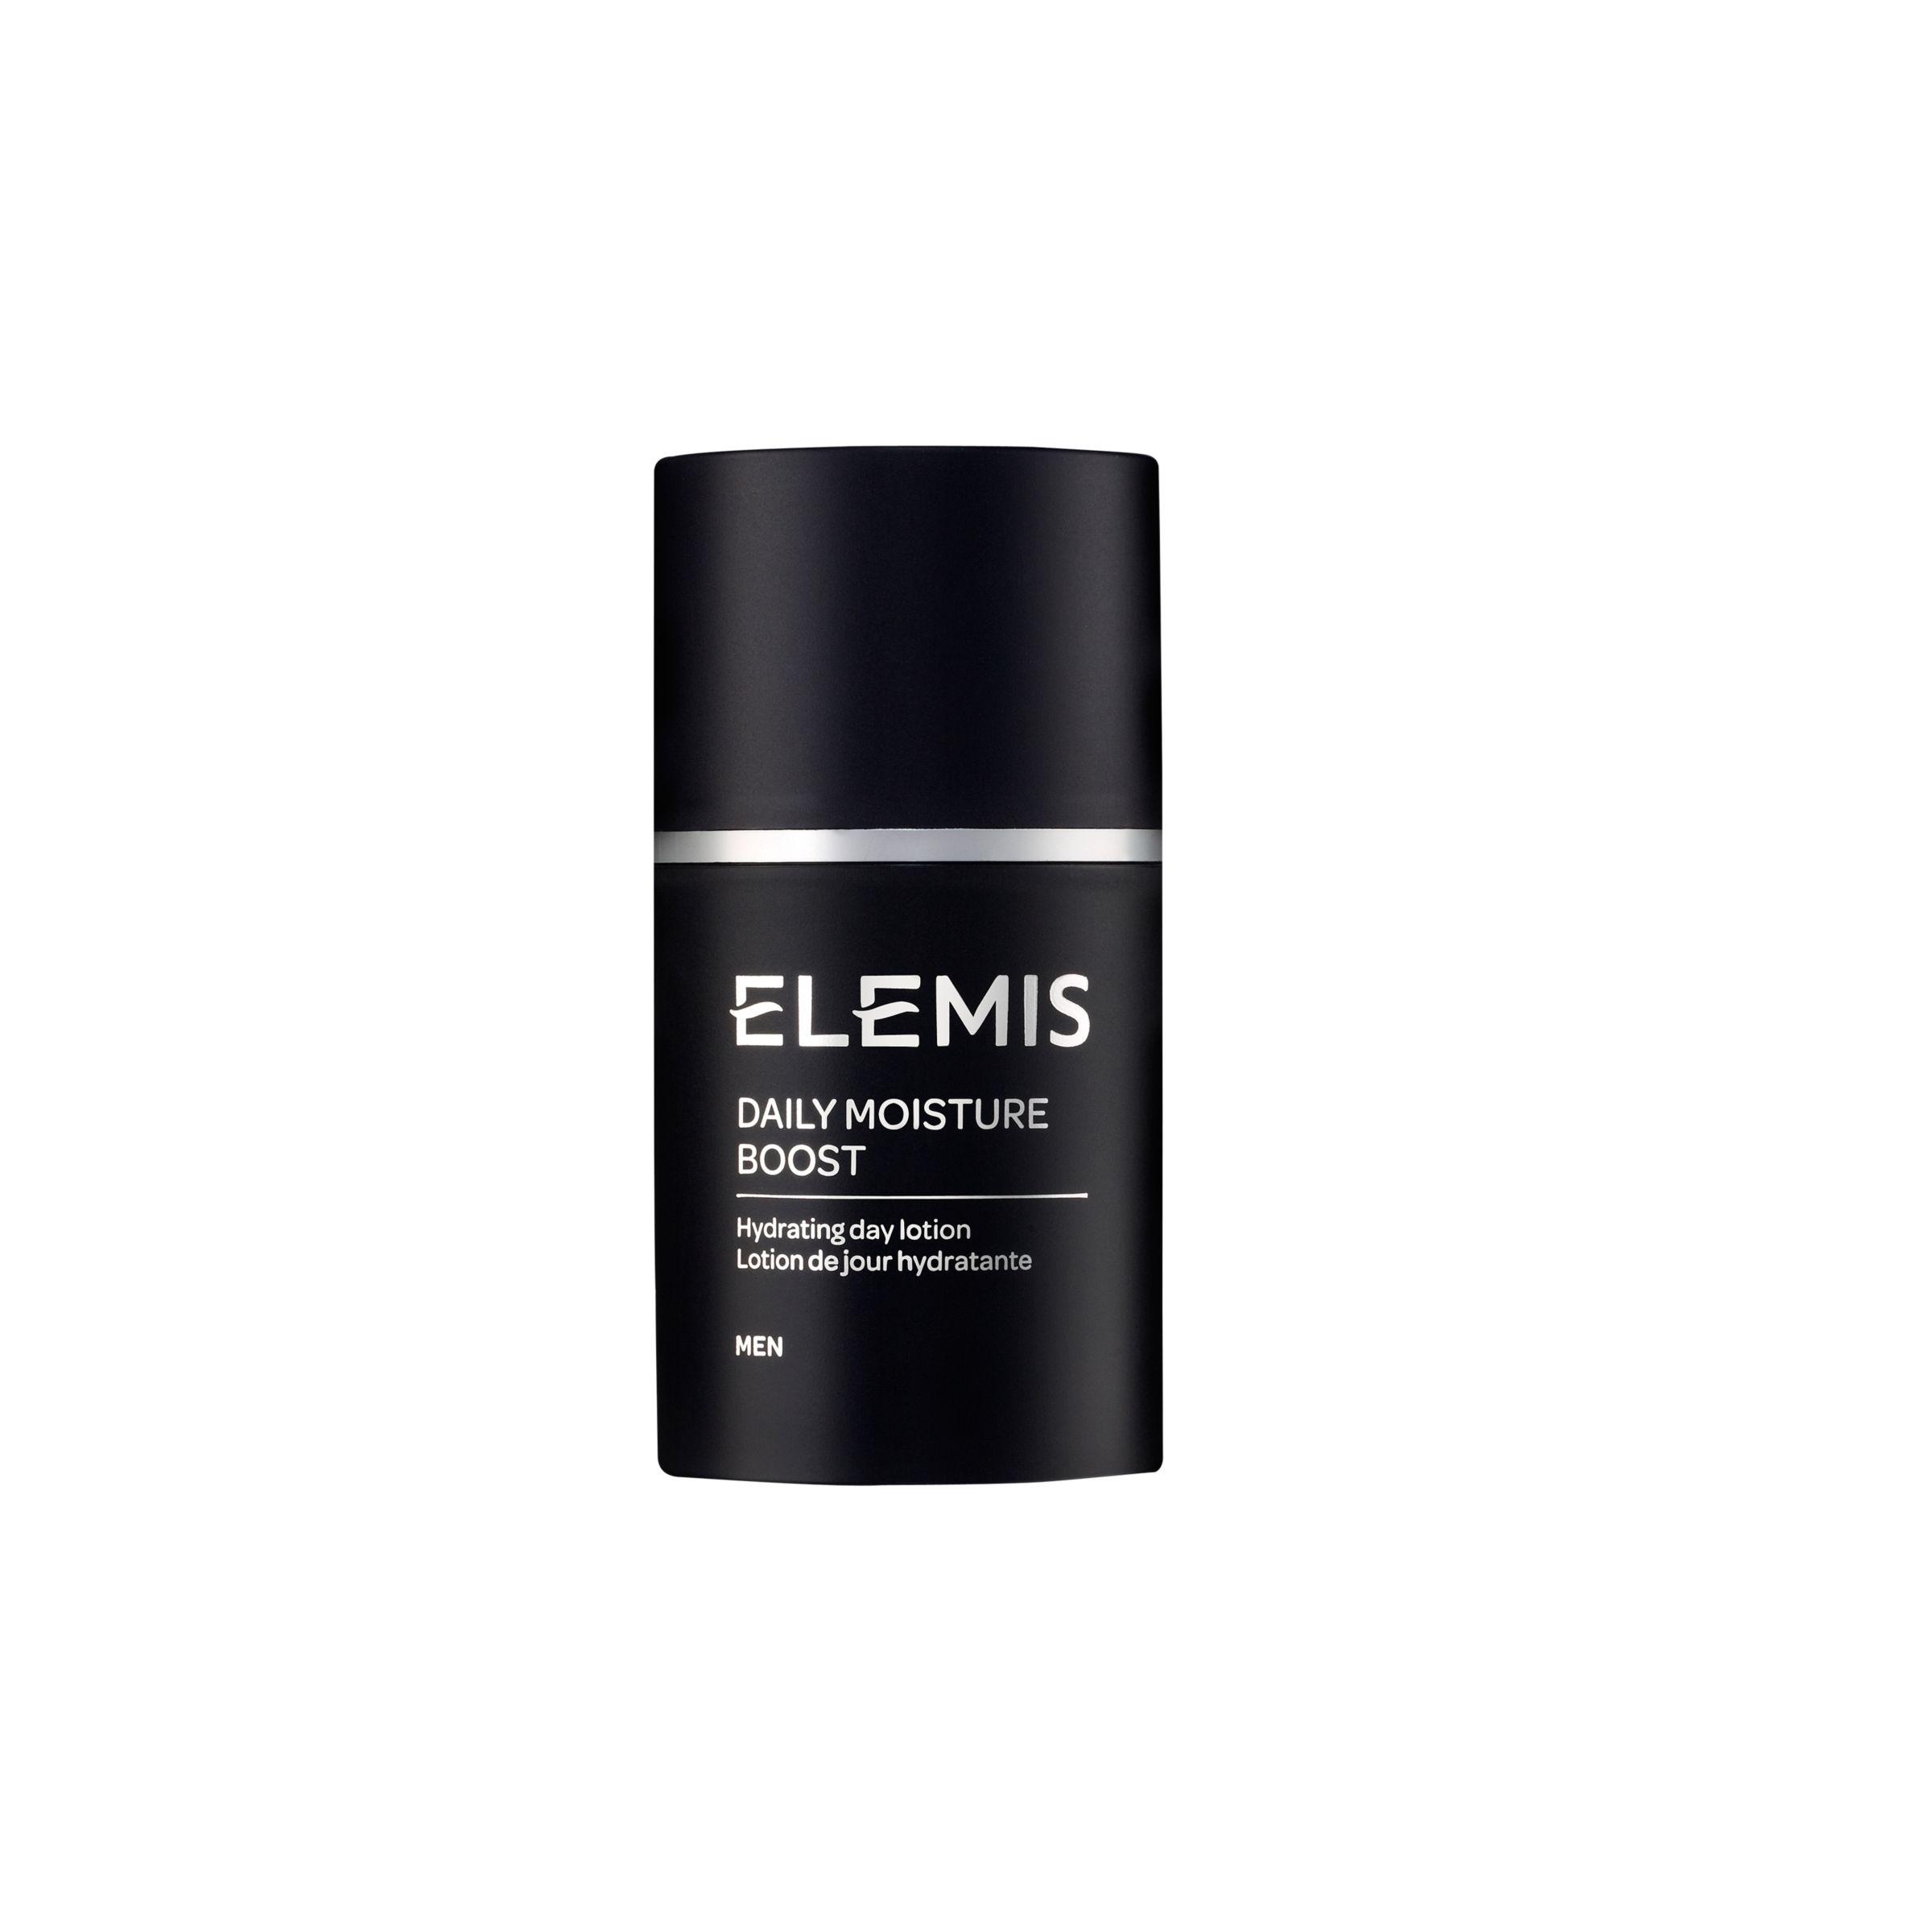 Elemis Elemis Daily Moisture Boost Cream, 50ml